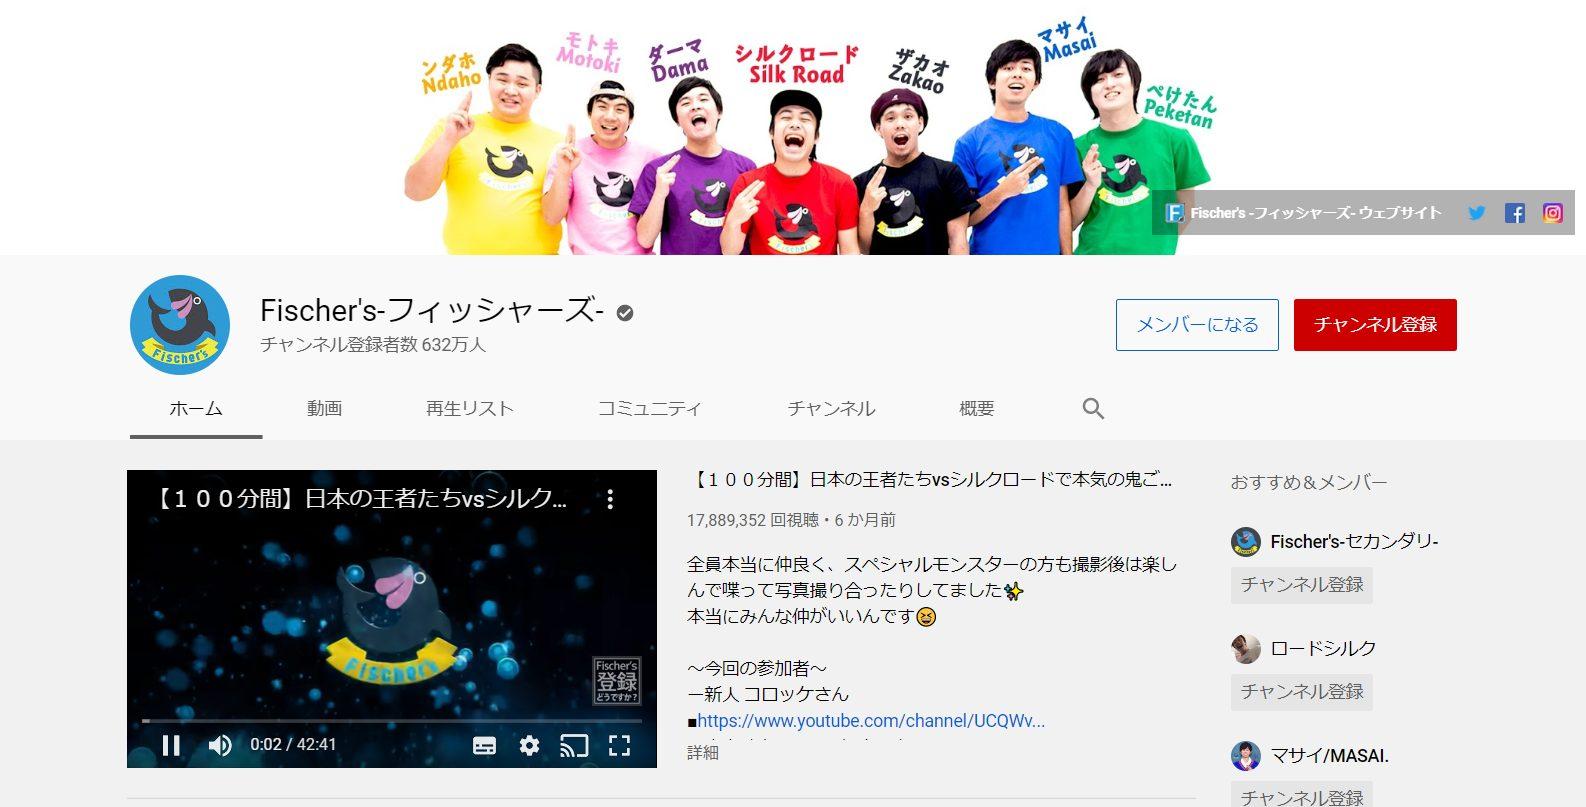 youtube-sports-influencer-fischers